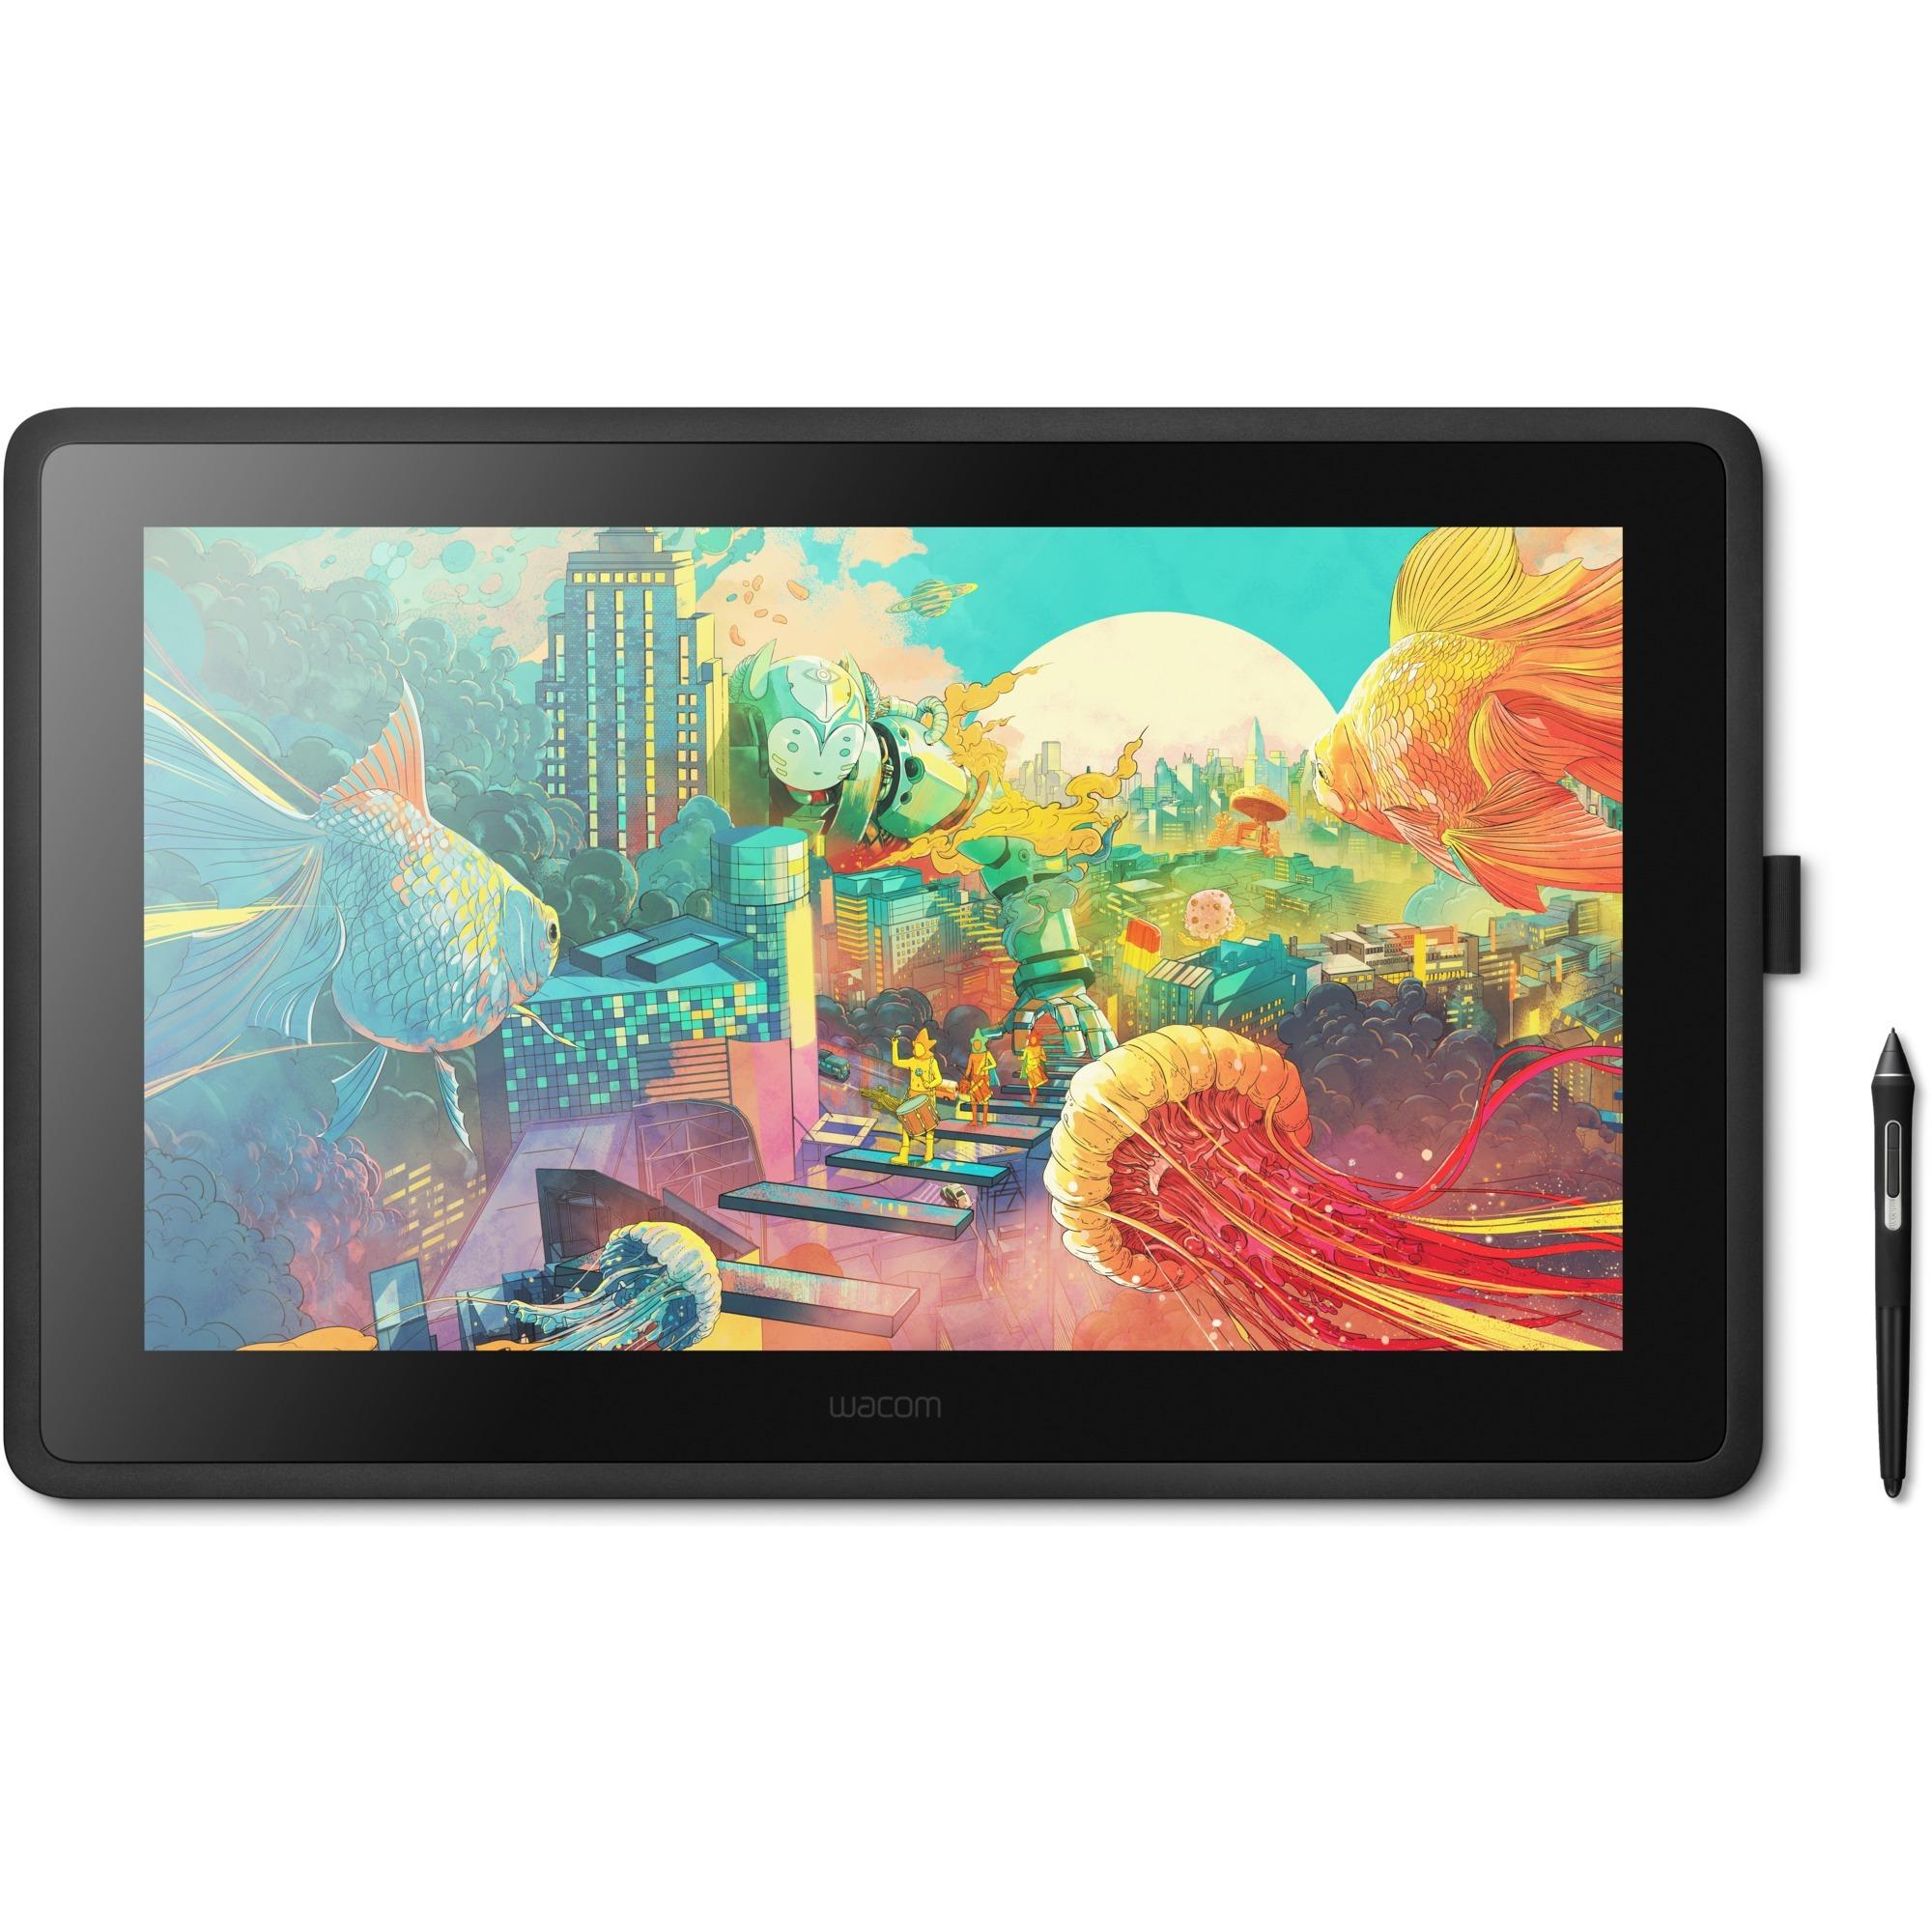 Cintiq DTK2260K0A tableta digitalizadora Negro, Tableta gráfica